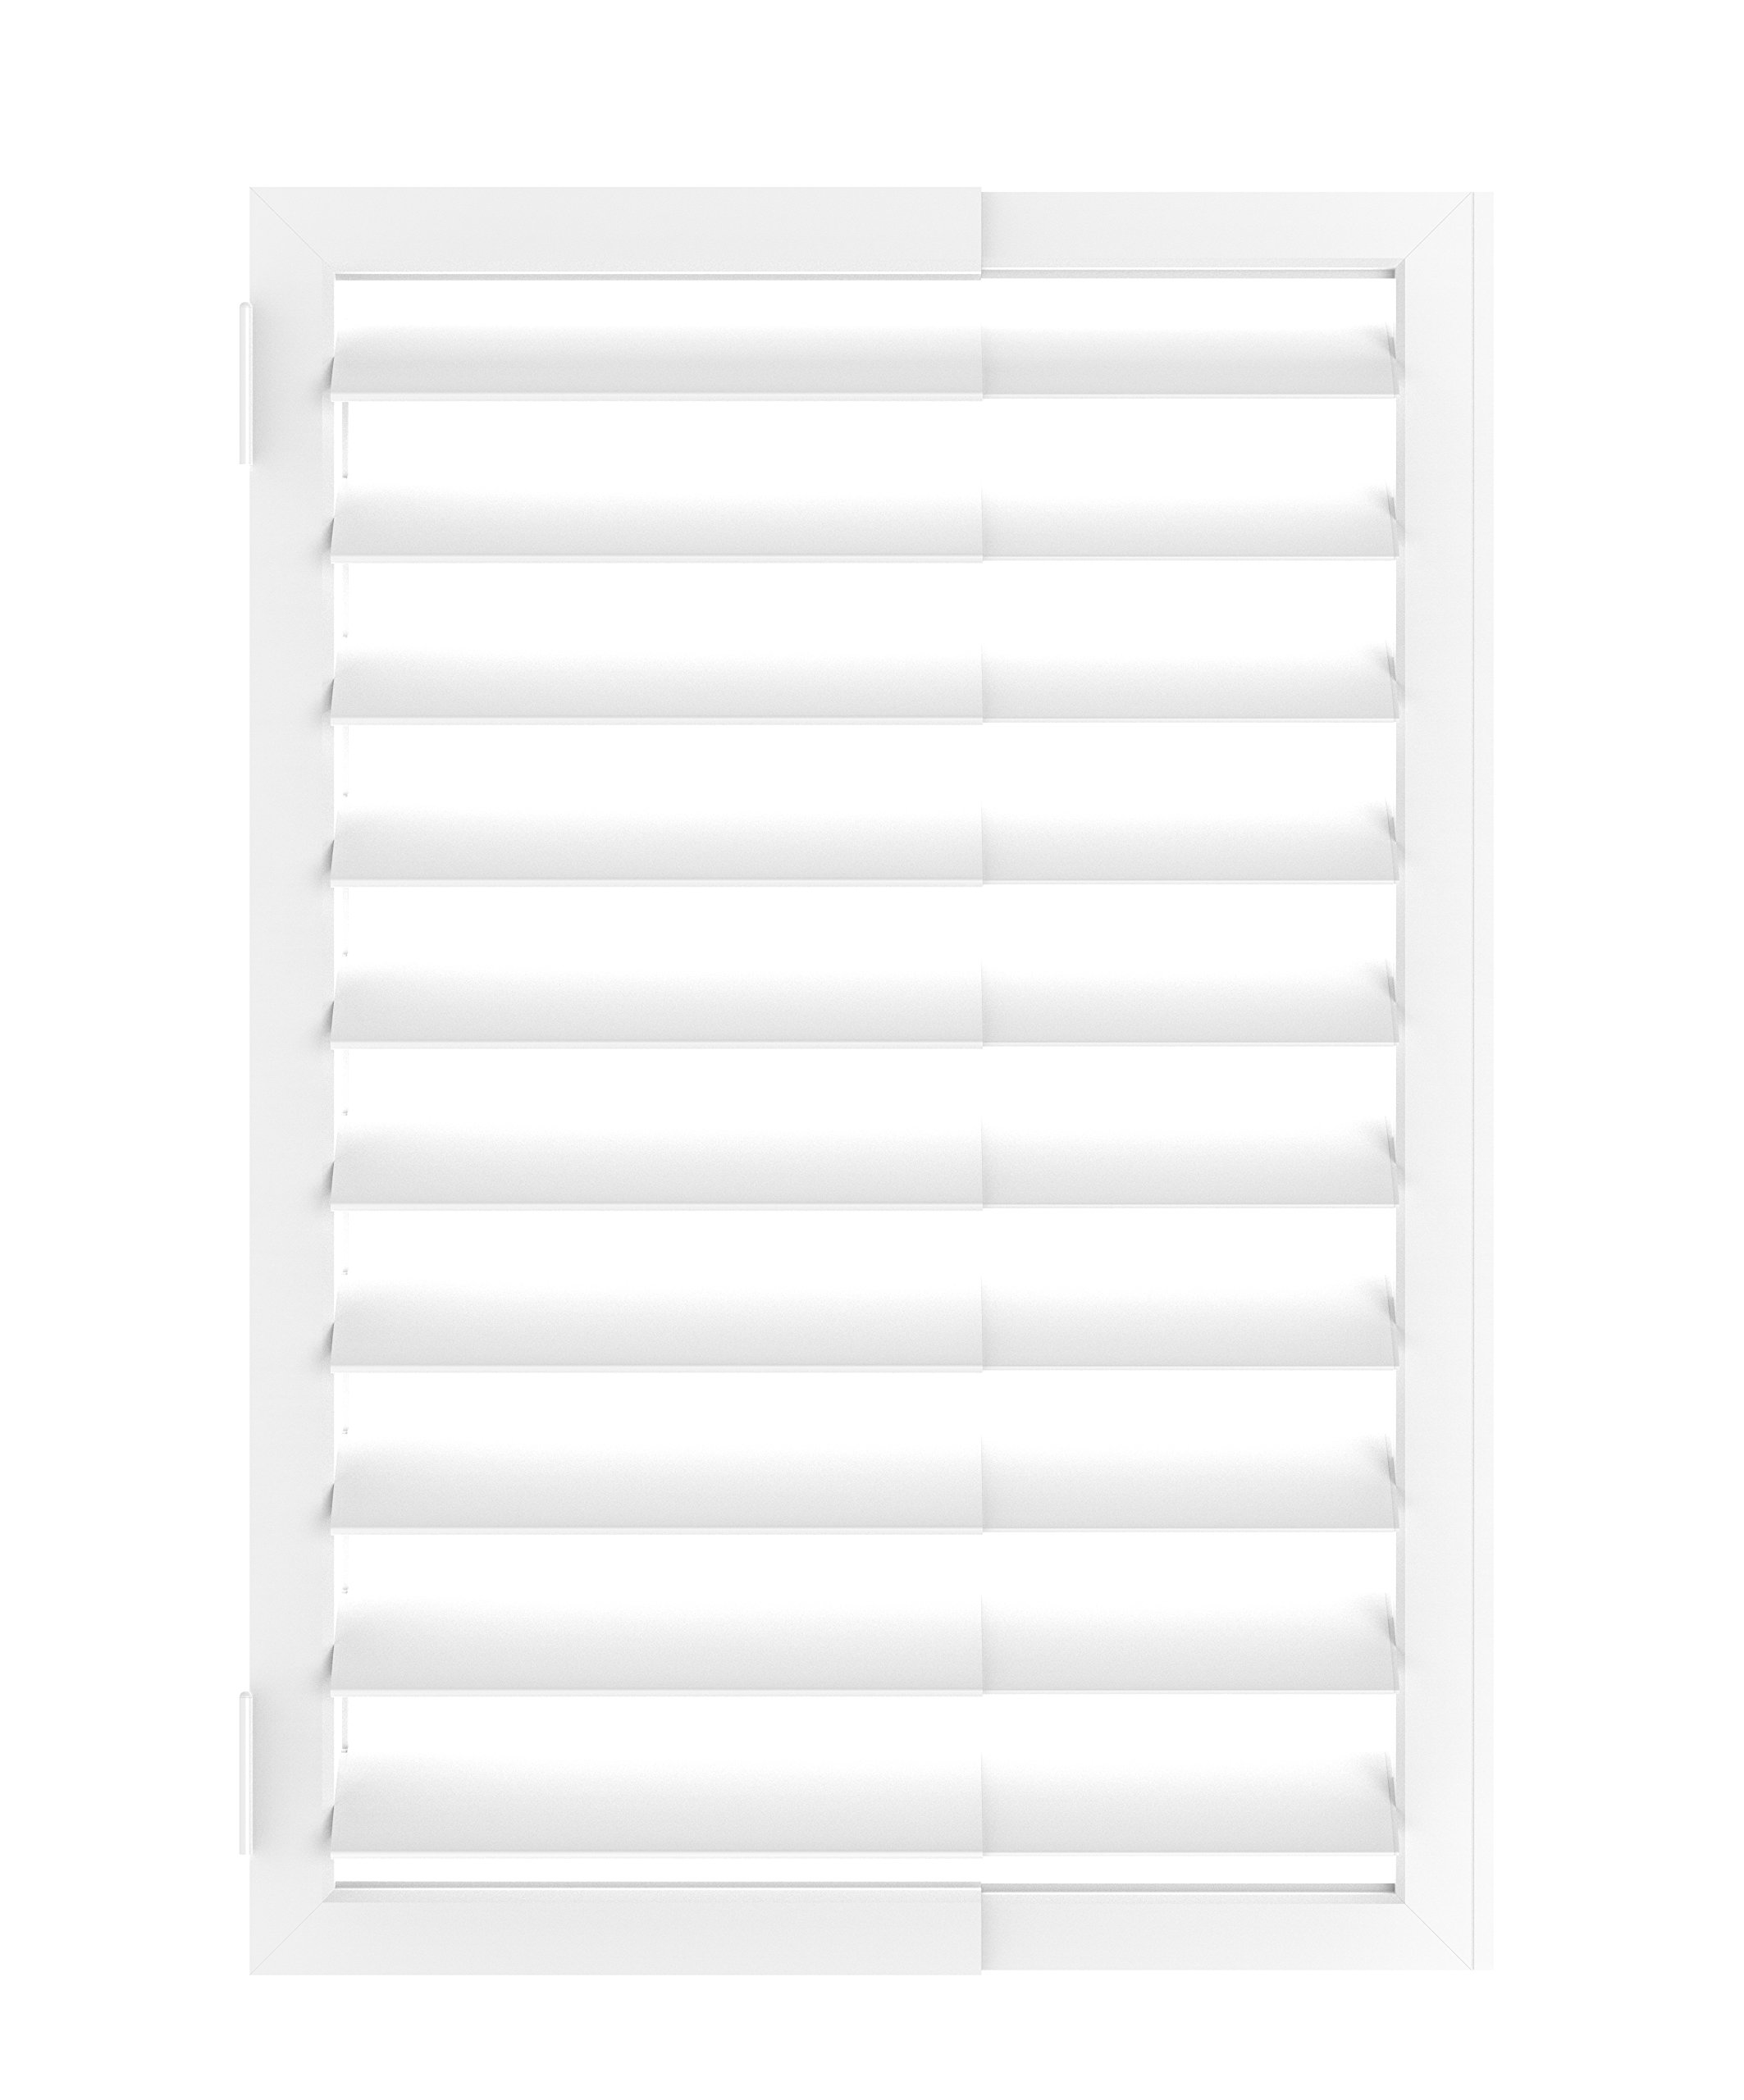 Umbra Expansa Expanding Interior Window Shutter, White